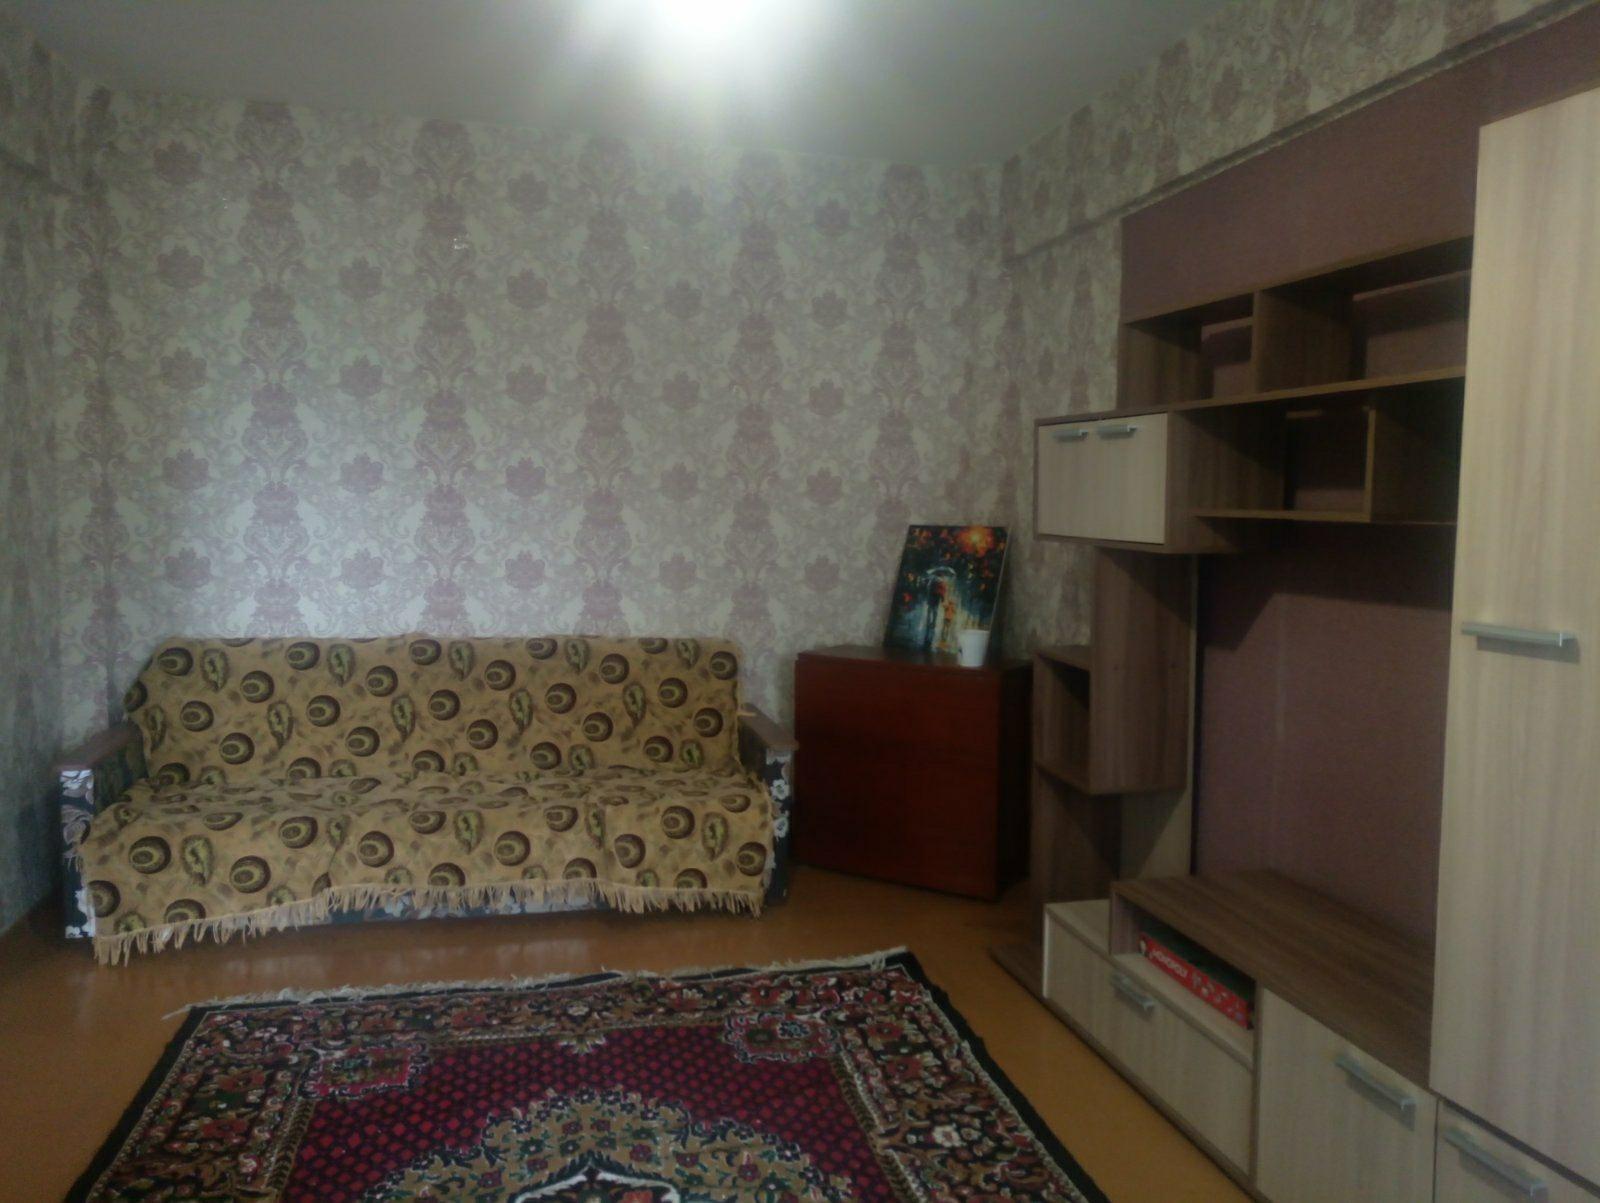 2к квартира улица Семафорная, 445 корпус 4 | 13500 | аренда в Красноярске фото 0